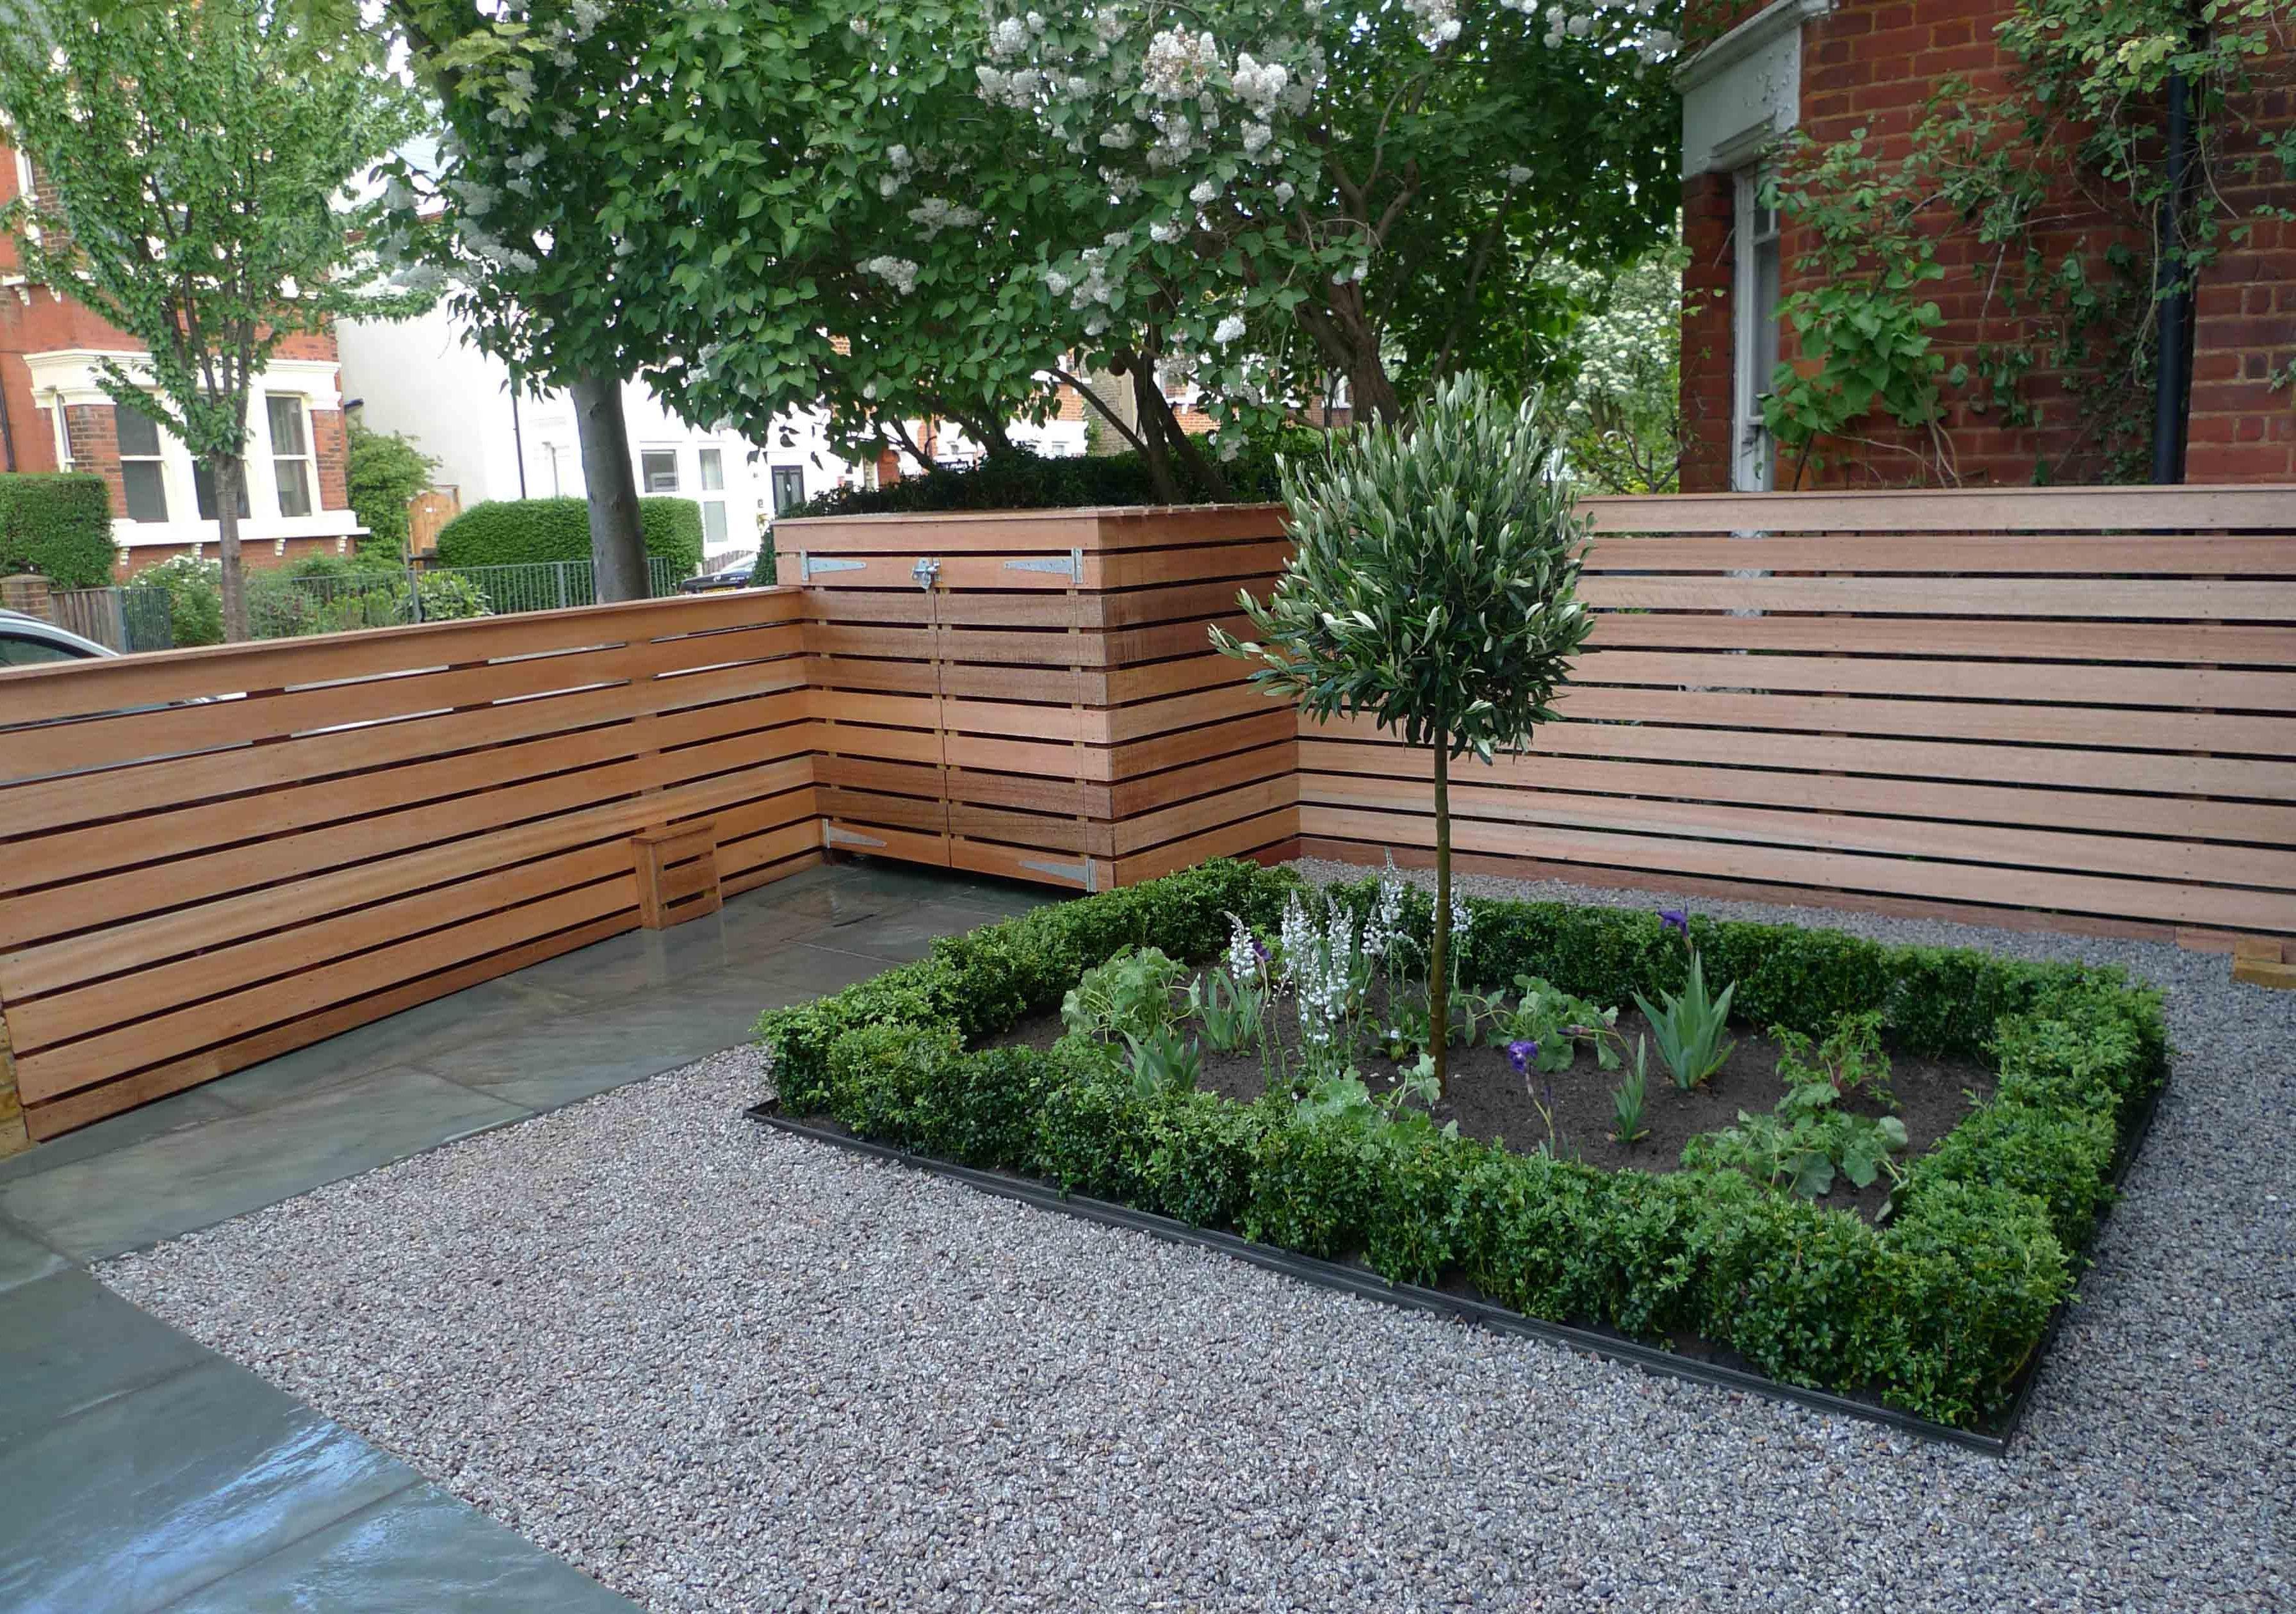 10 Garden Wall Ideas Most Of The Elegant And Also Attractive Front Garden Front Garden Design Small Garden Fence Modern front garden fence ideas